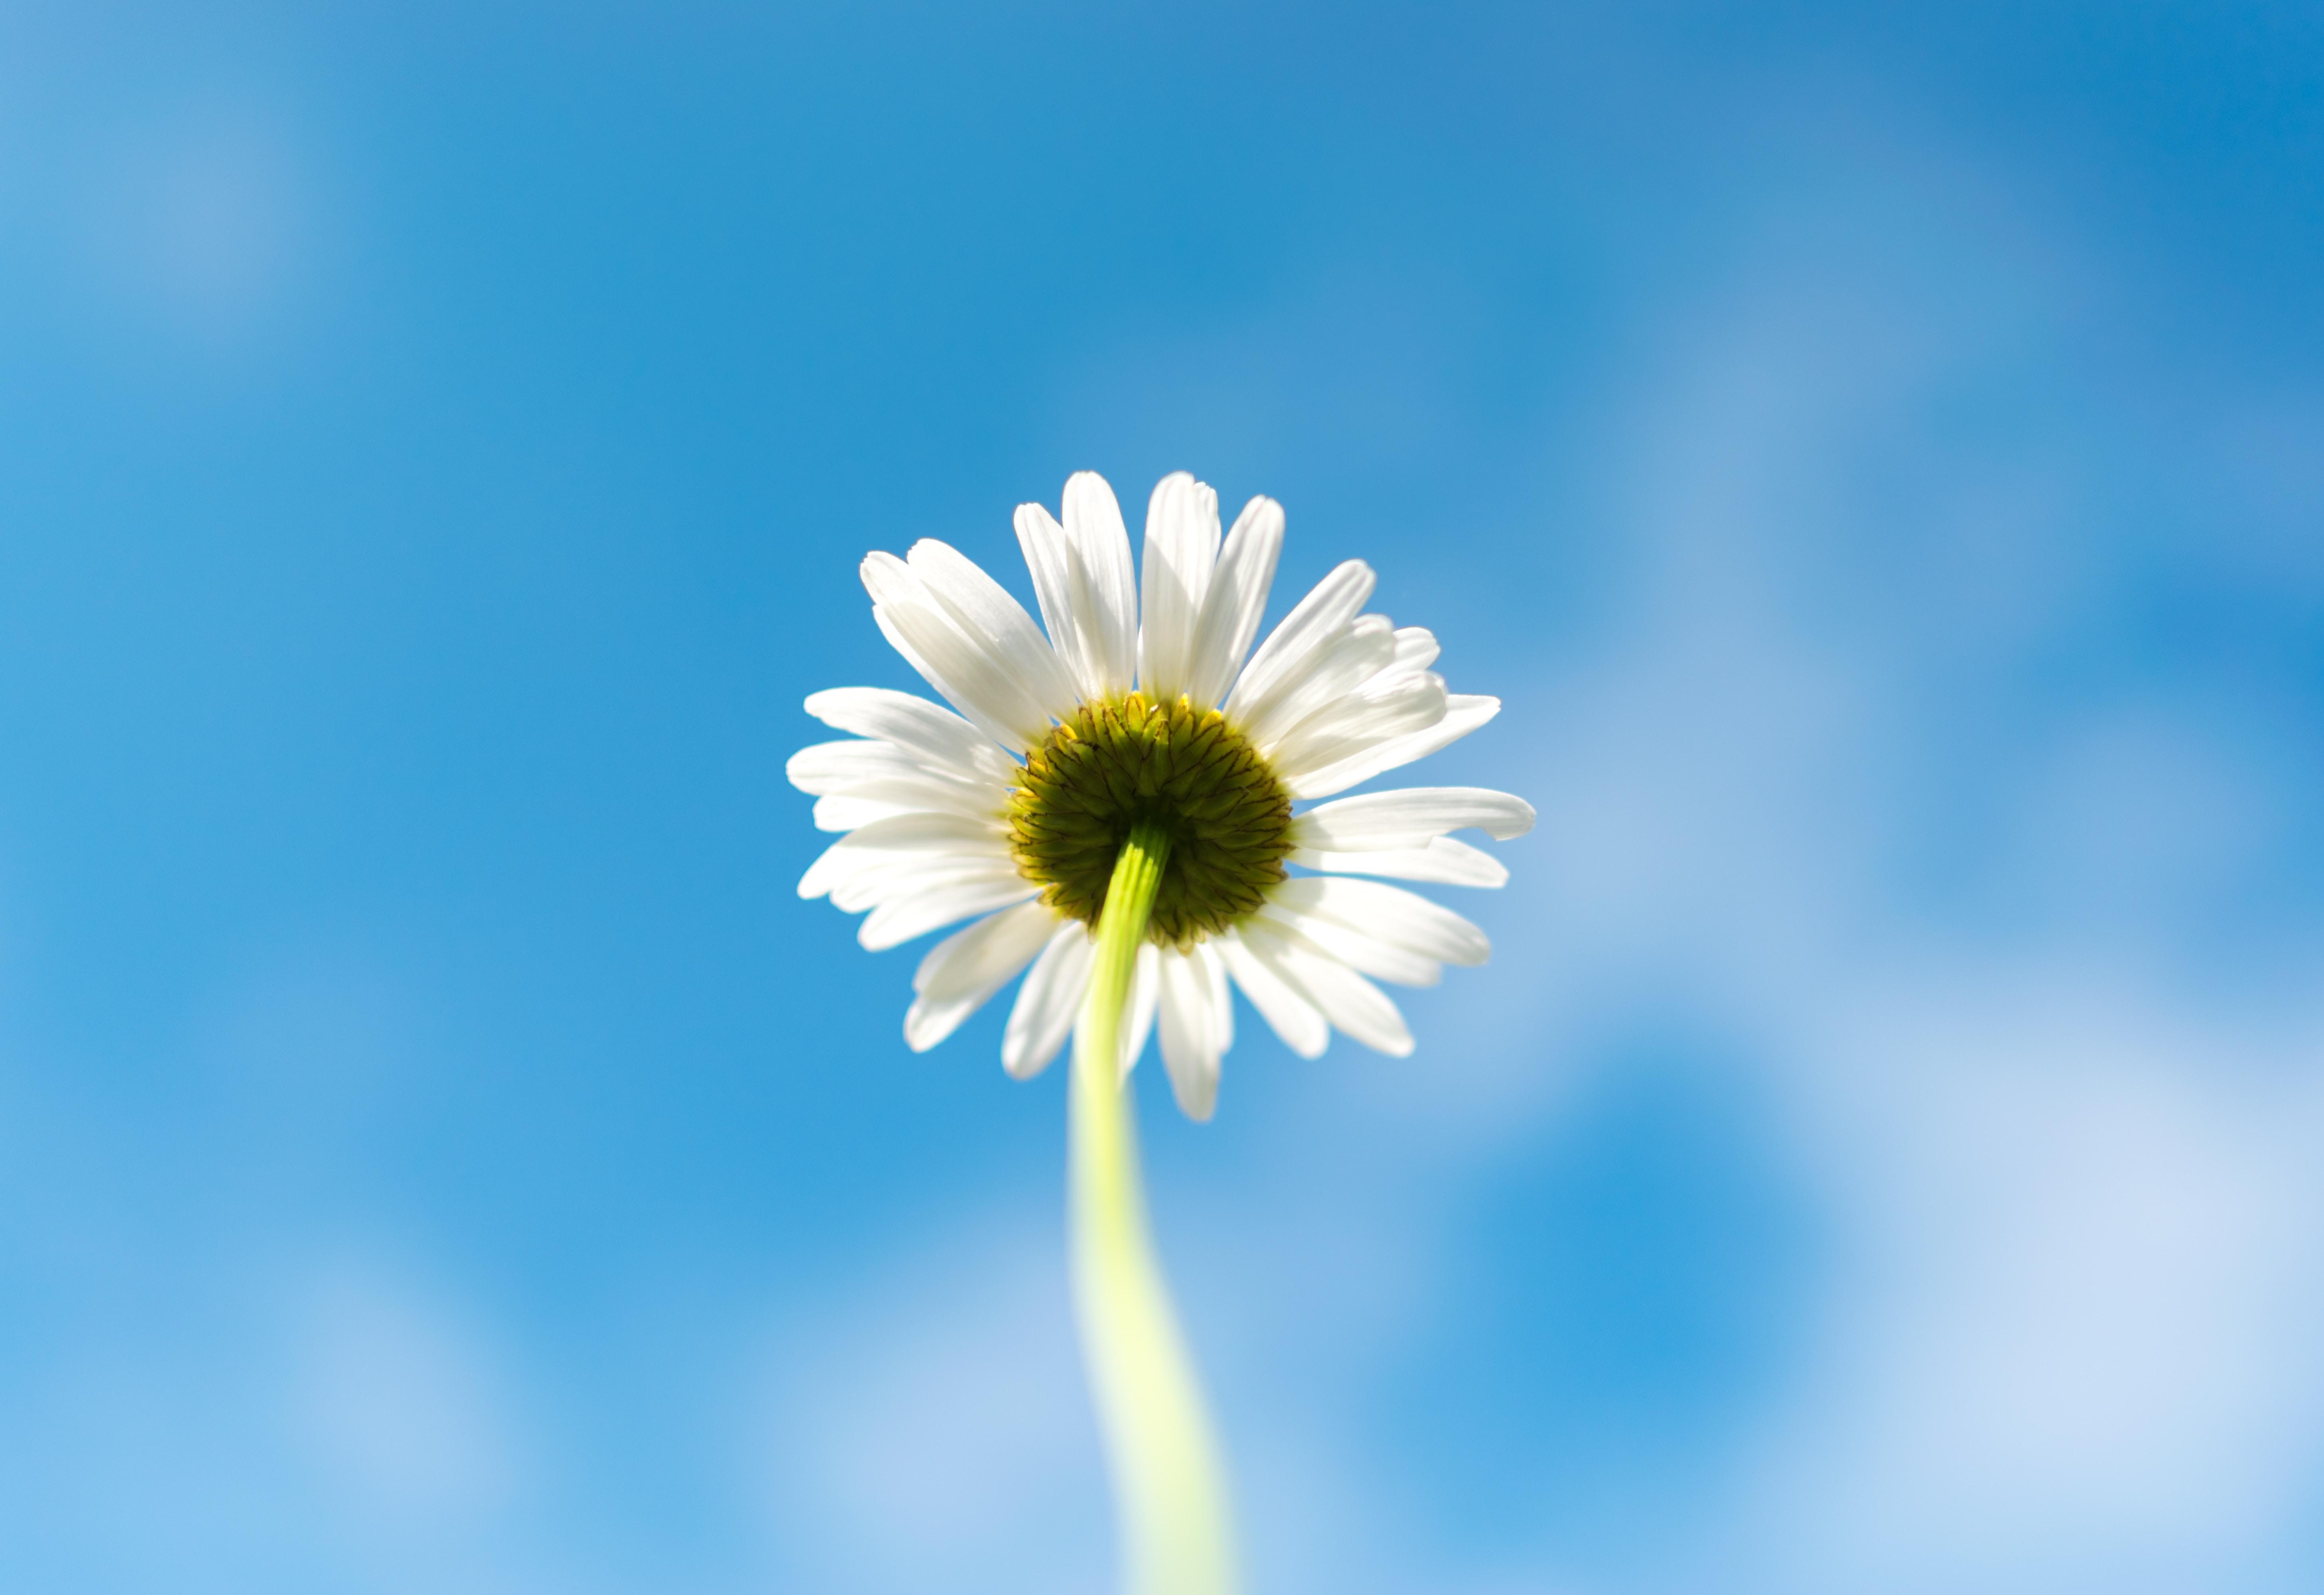 macro shot of white daisy flower